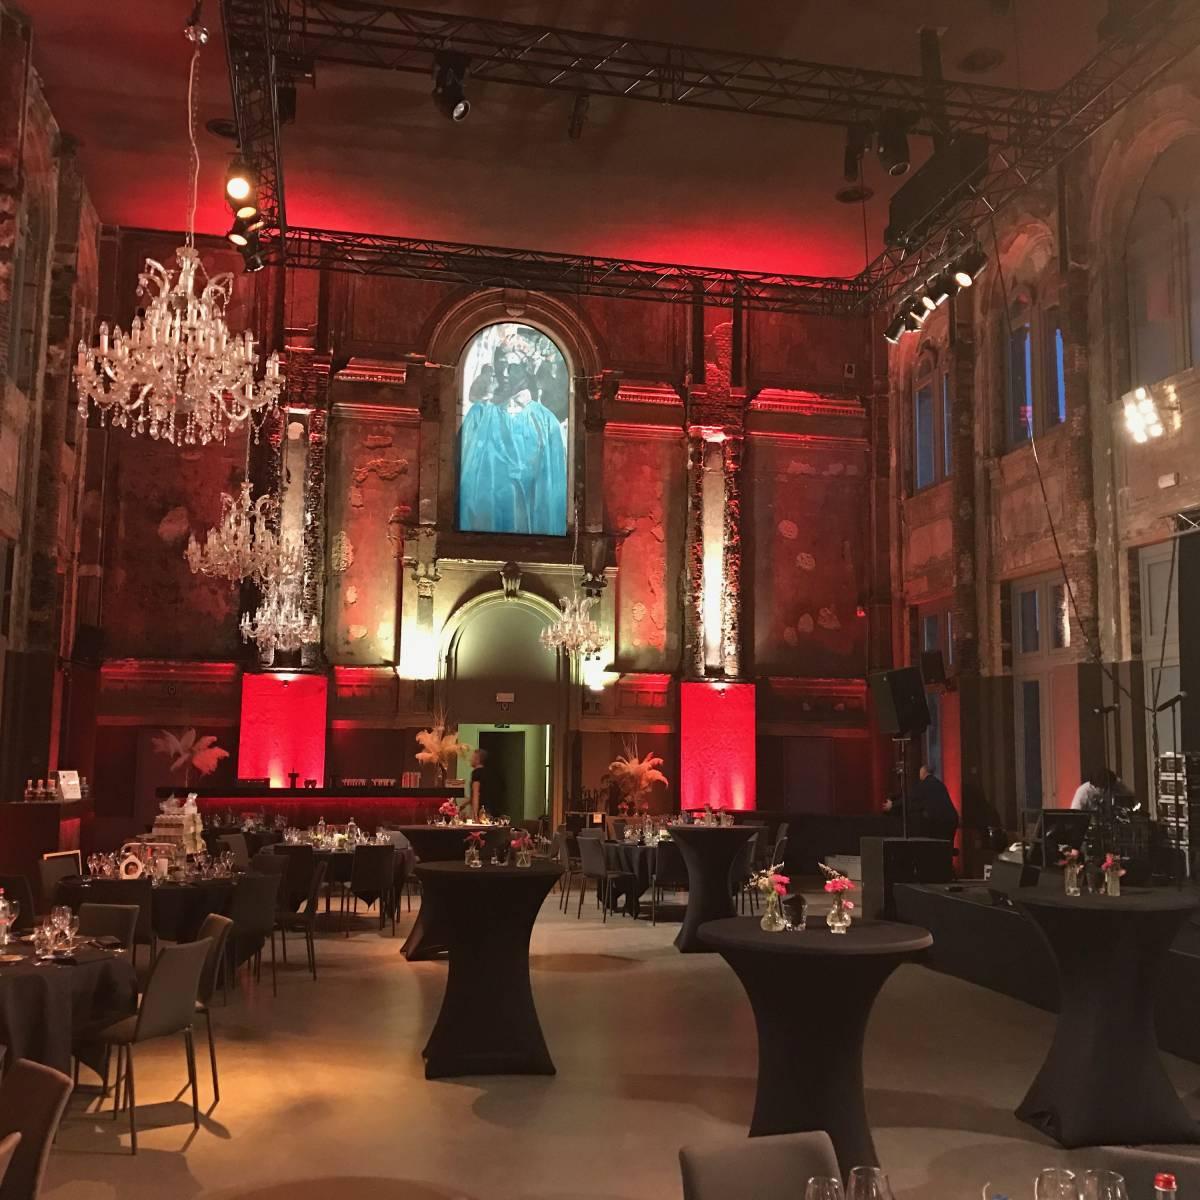 Zaal AthenA - Feestzaal - Trouwzaal - Antwerpen - House of Weddings - 21